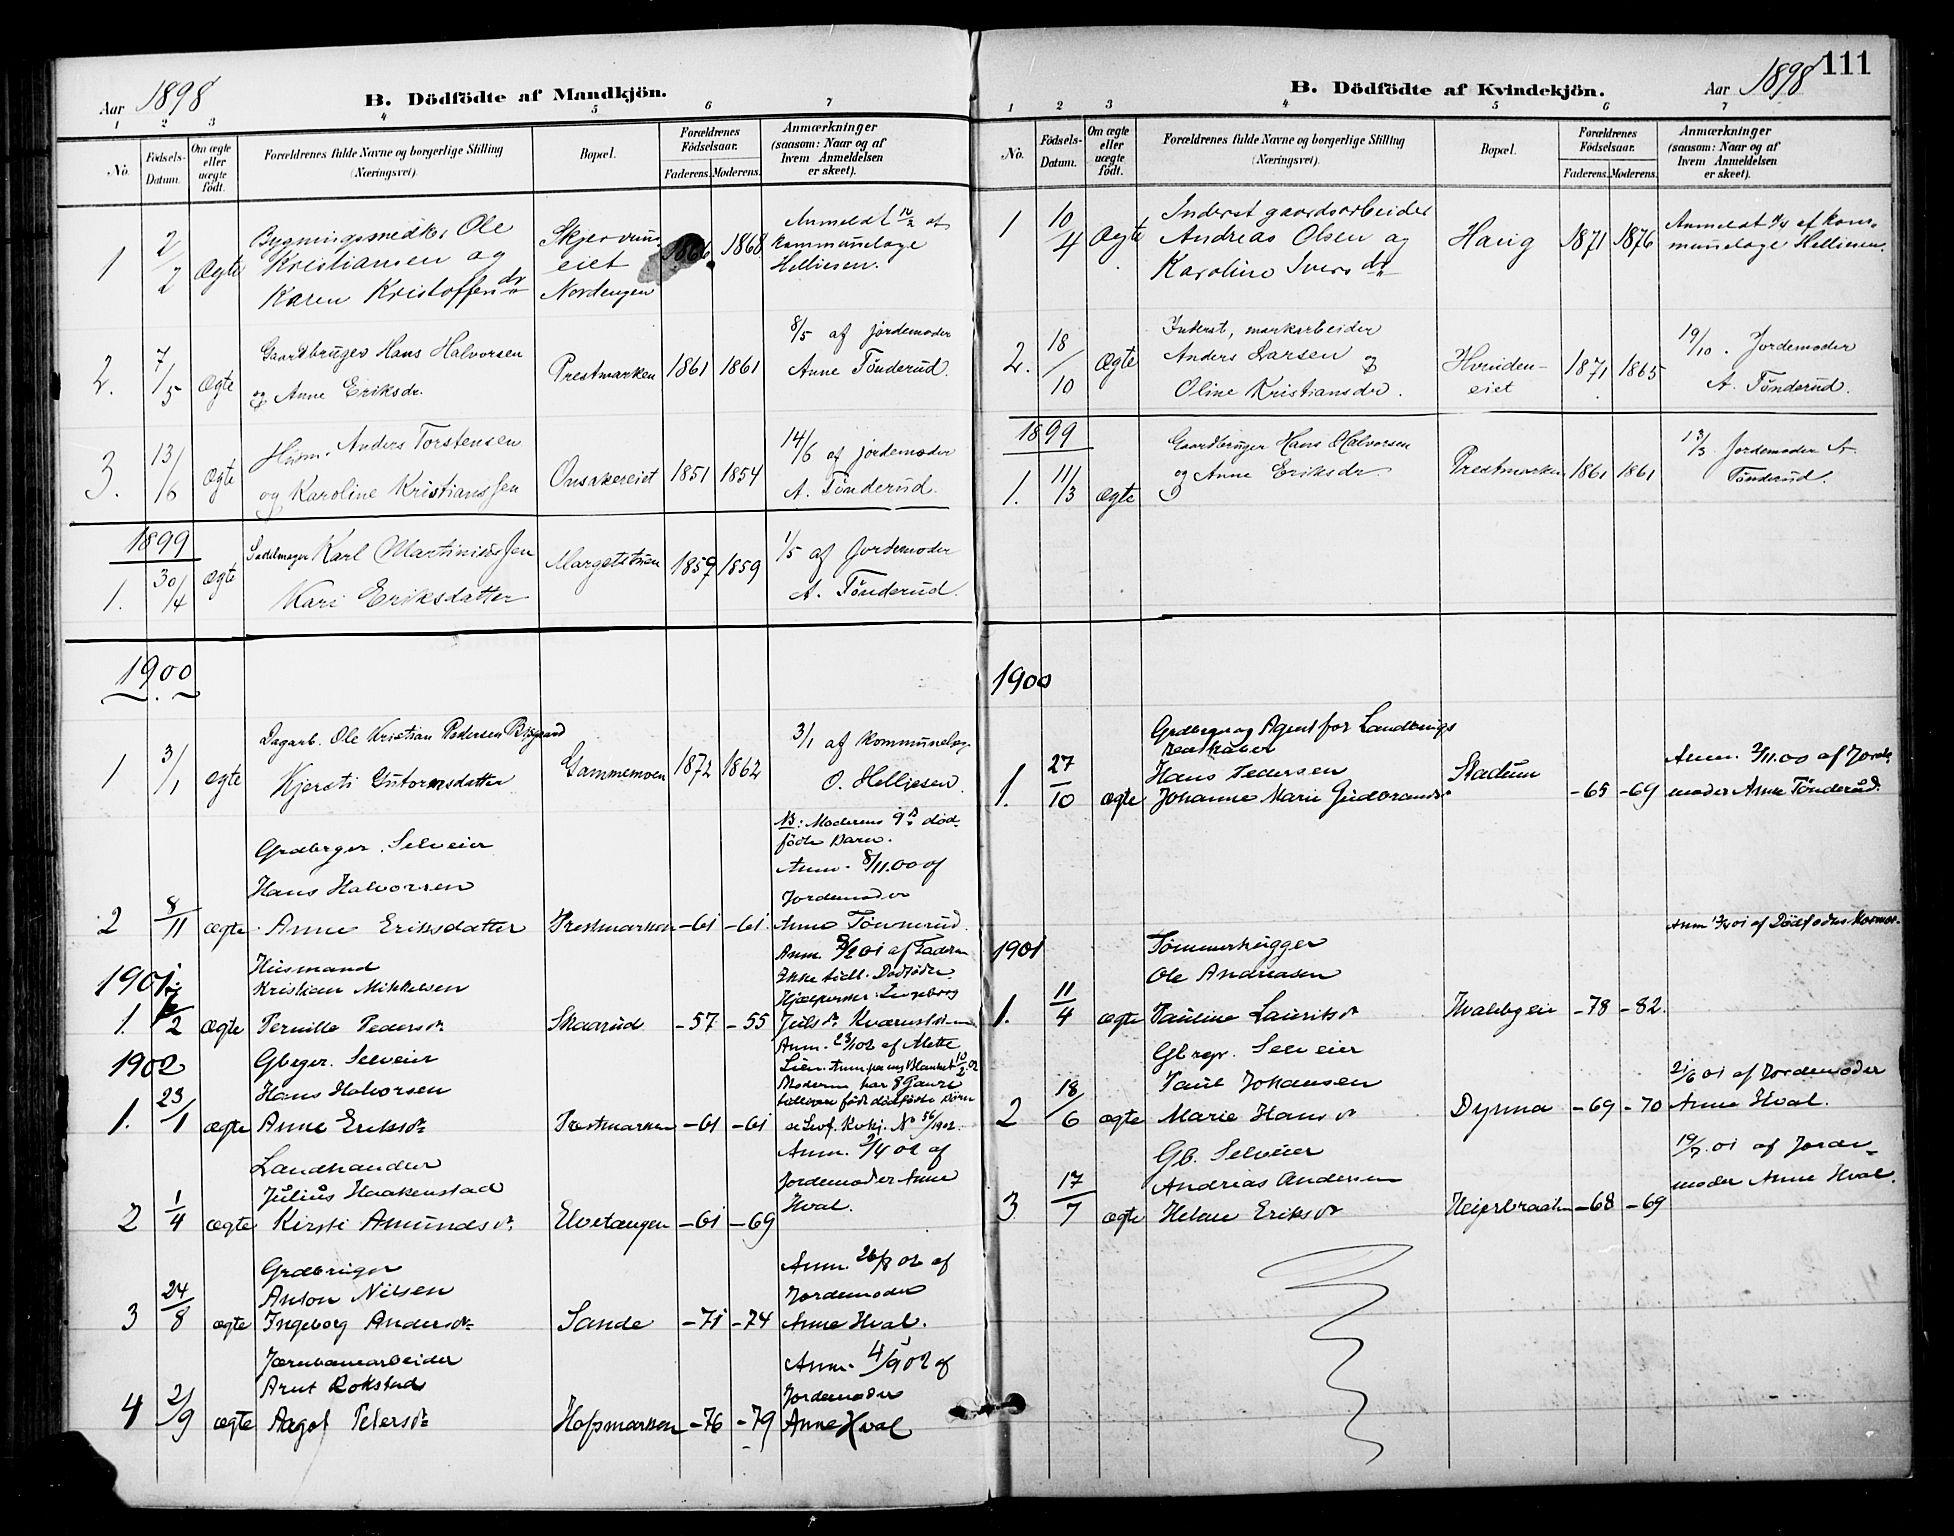 SAH, Gran prestekontor, Ministerialbok nr. 19, 1898-1907, s. 111